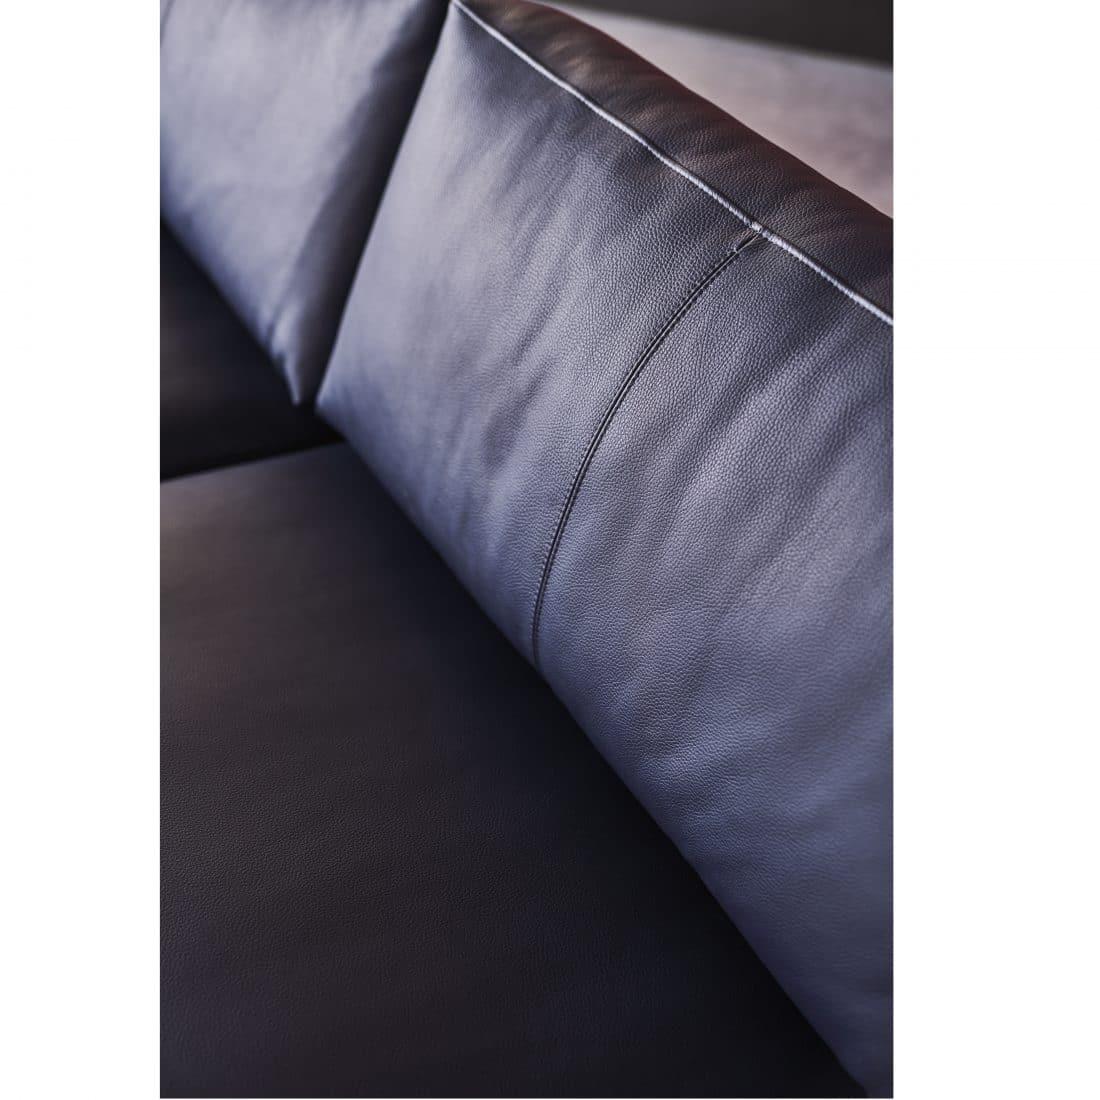 Leolux Bellice Leather Black 0017 2 Scaled